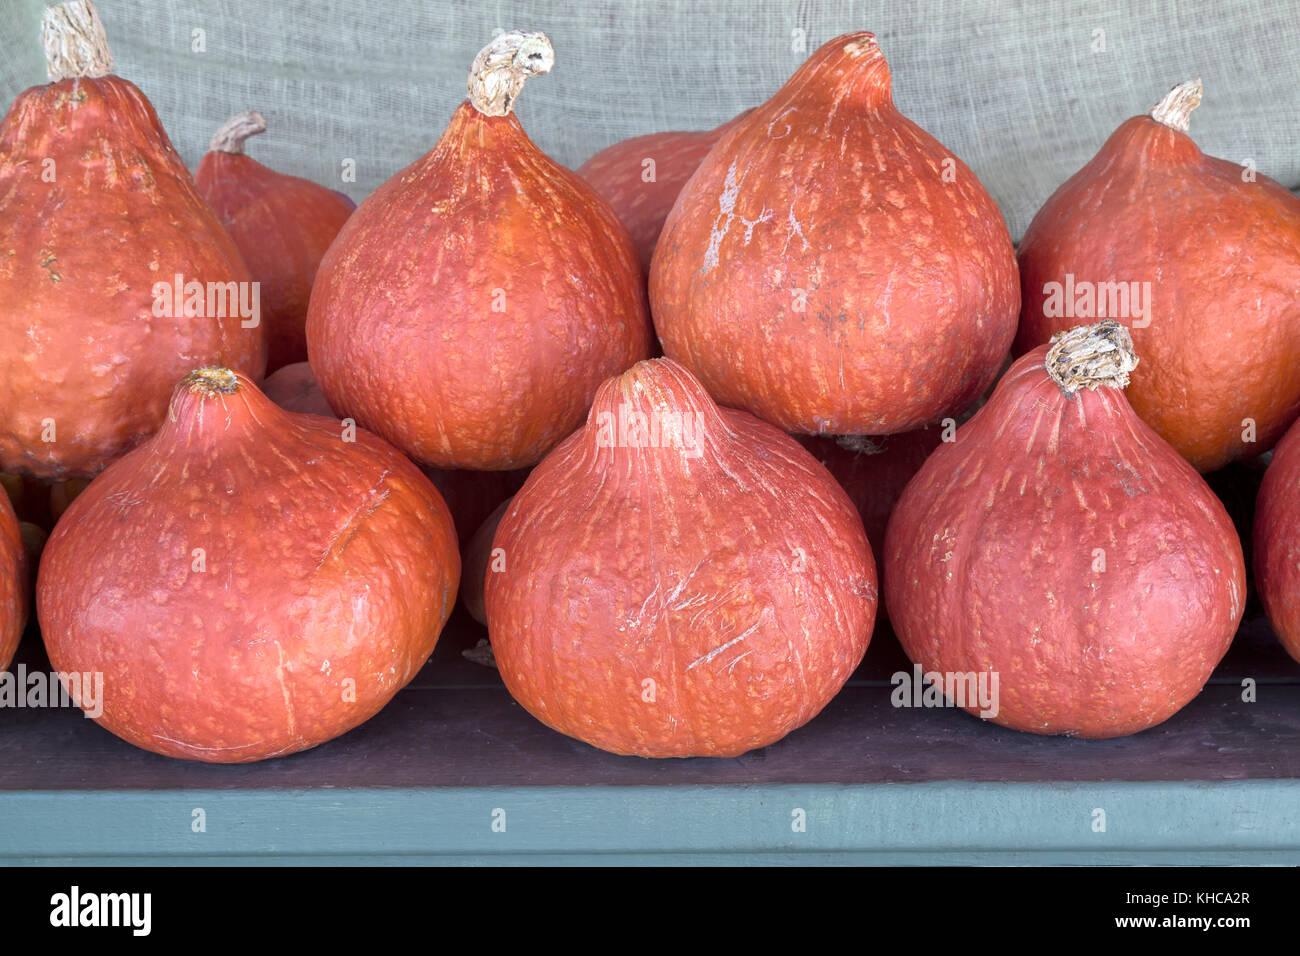 Harvested Red Kuri squash 'Cucurbita maxima'. - Stock Image